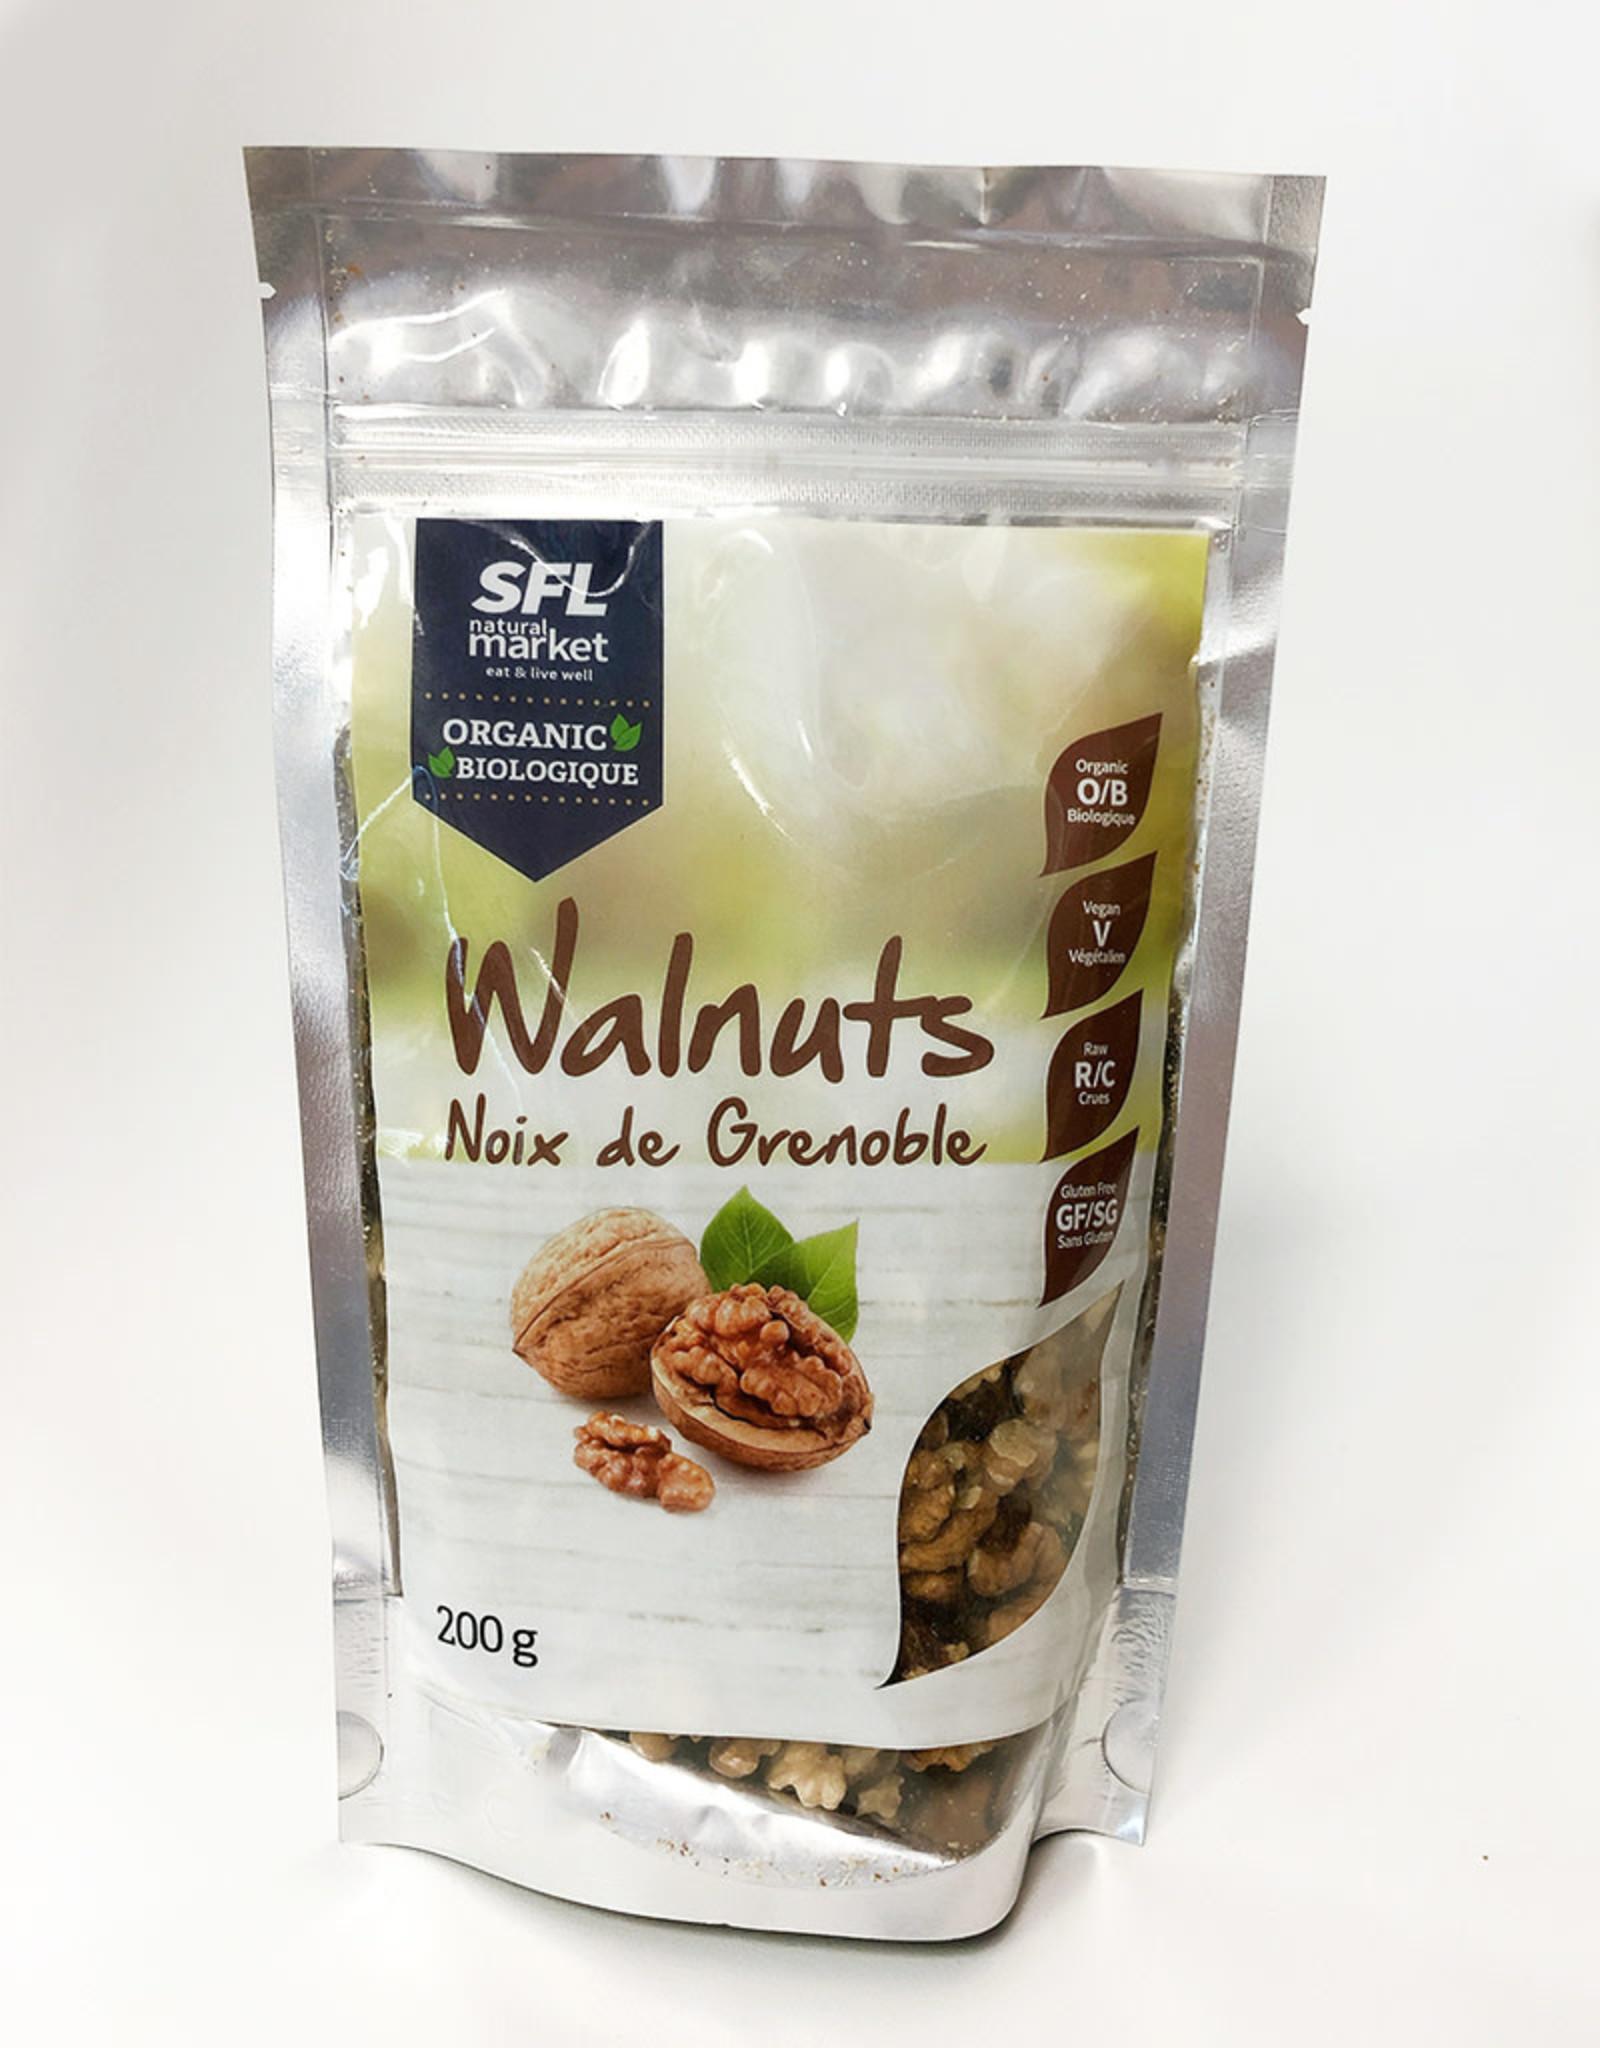 Simply For Life SFL - Organic Walnuts (250g)